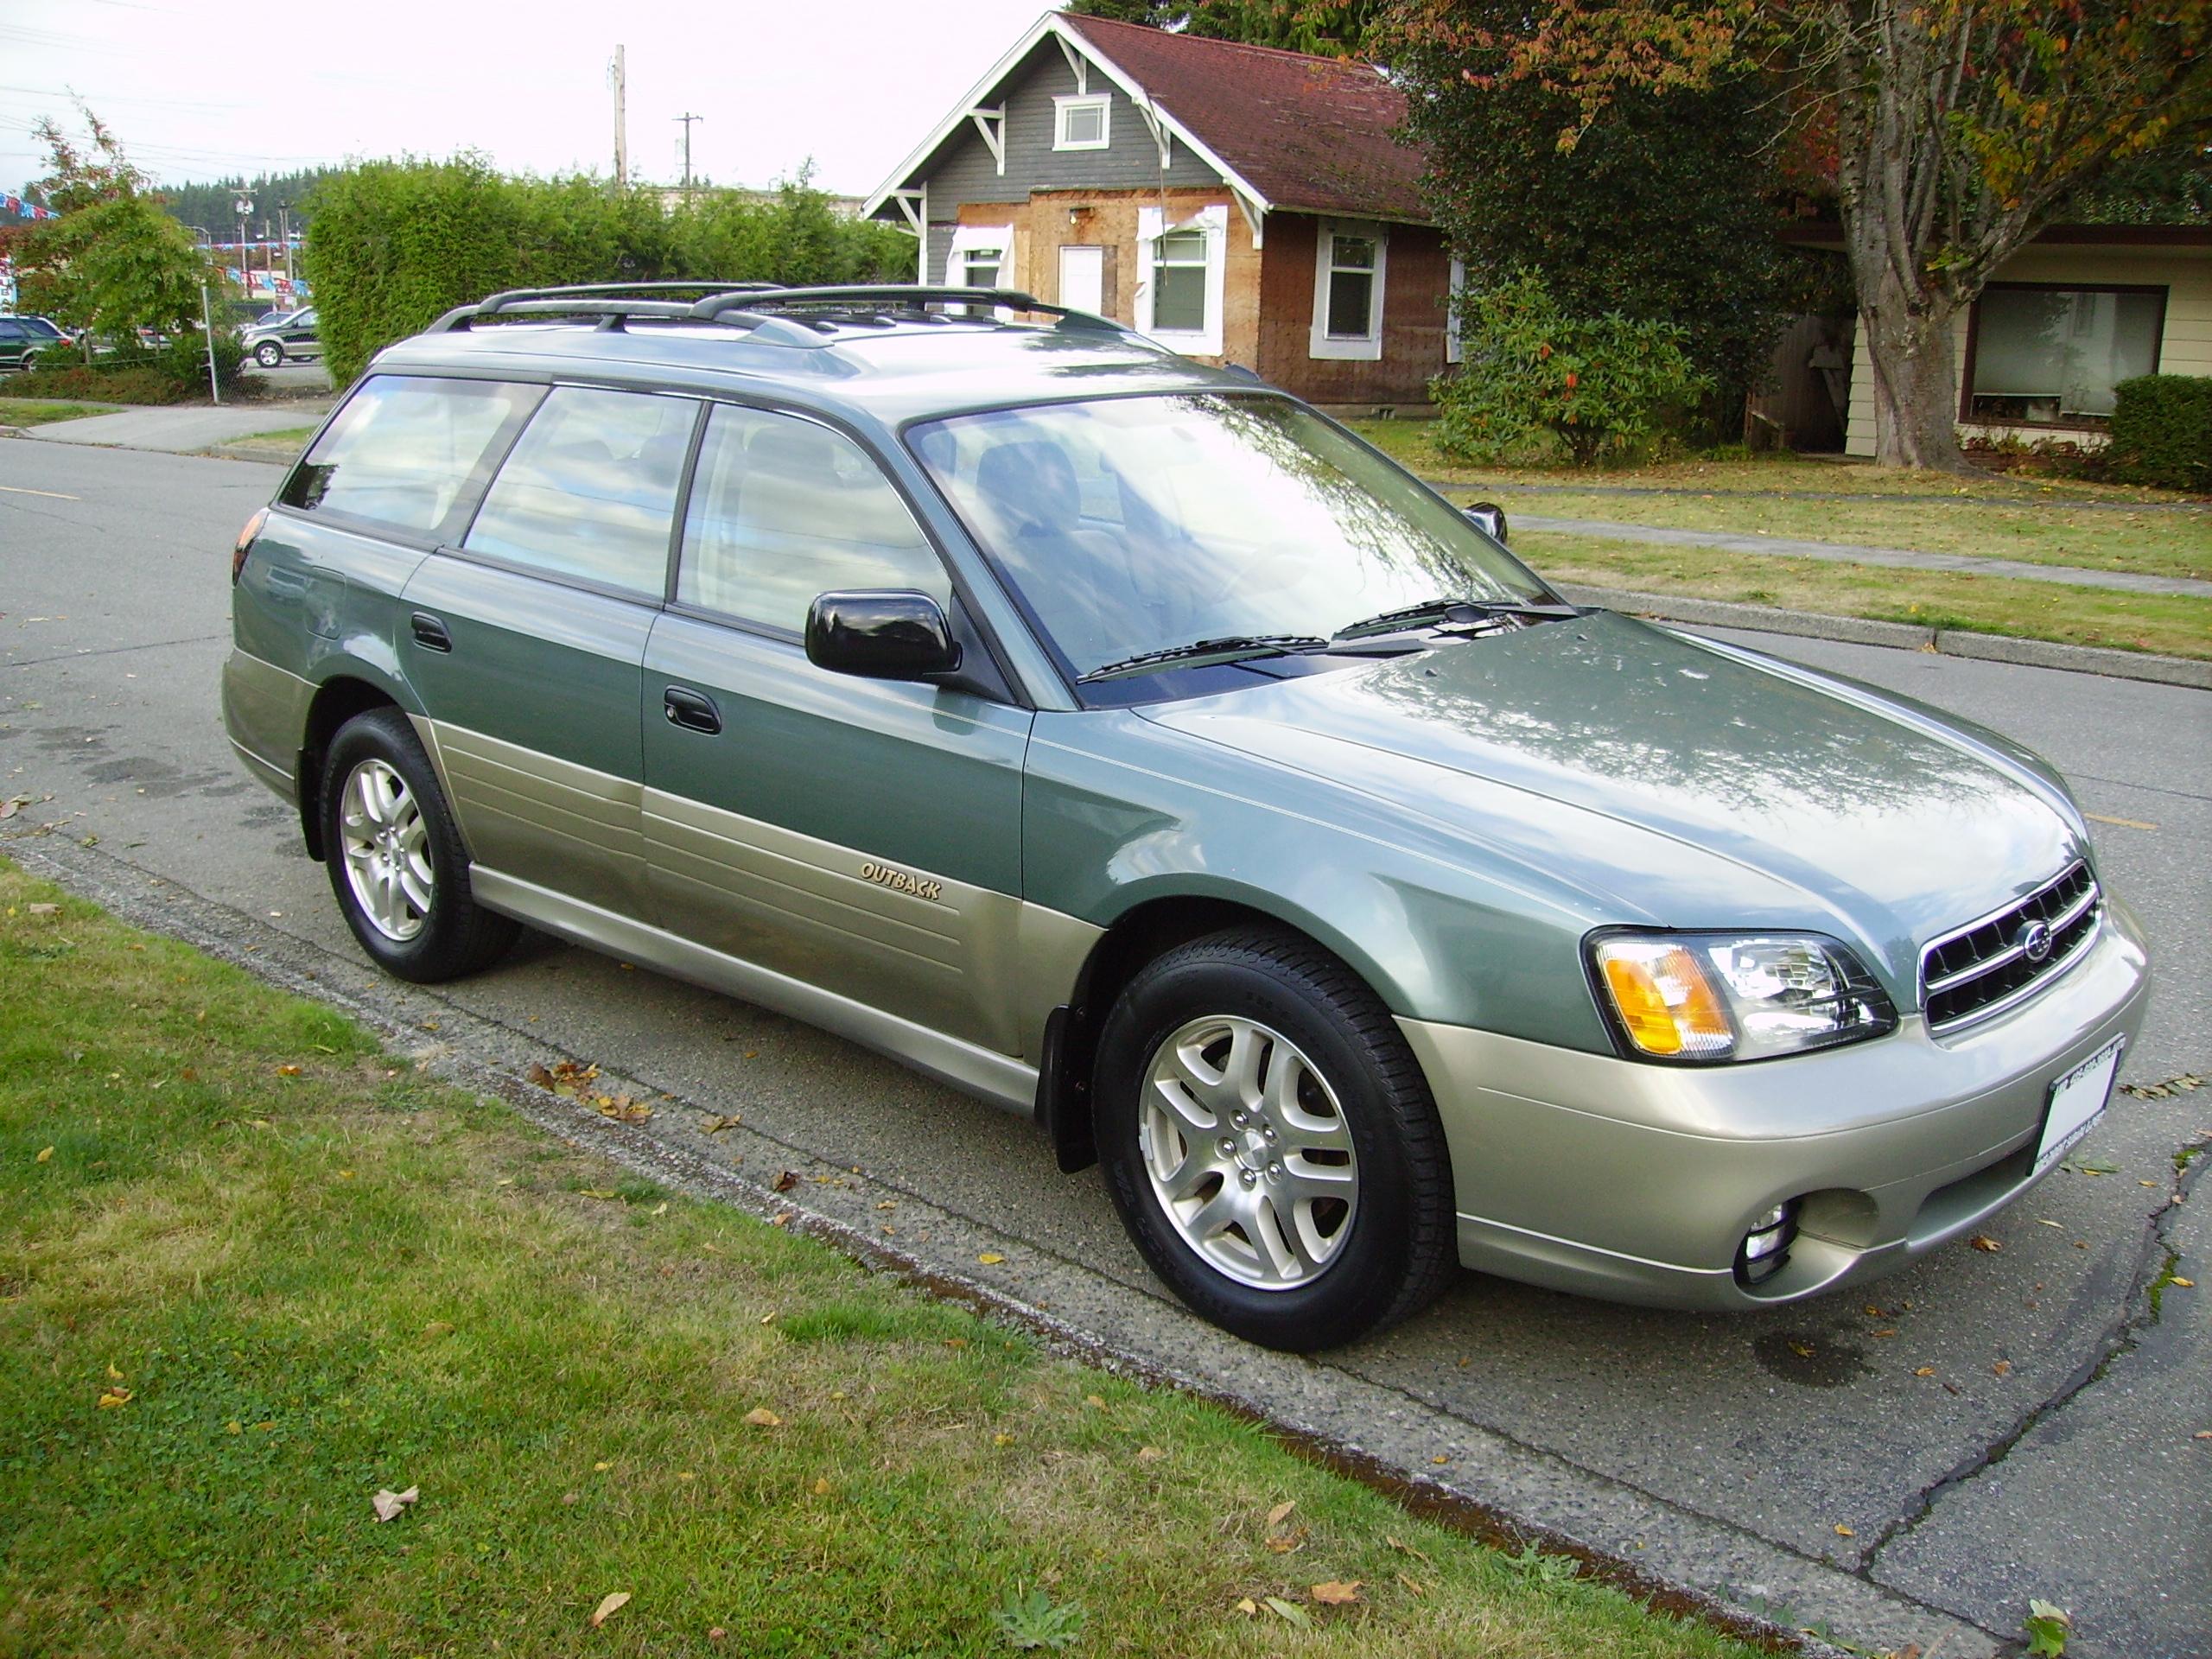 2000 Subaru Outback Awd Fuses Wagon Auto Sales Rh Awdautosales Com Review Fuse